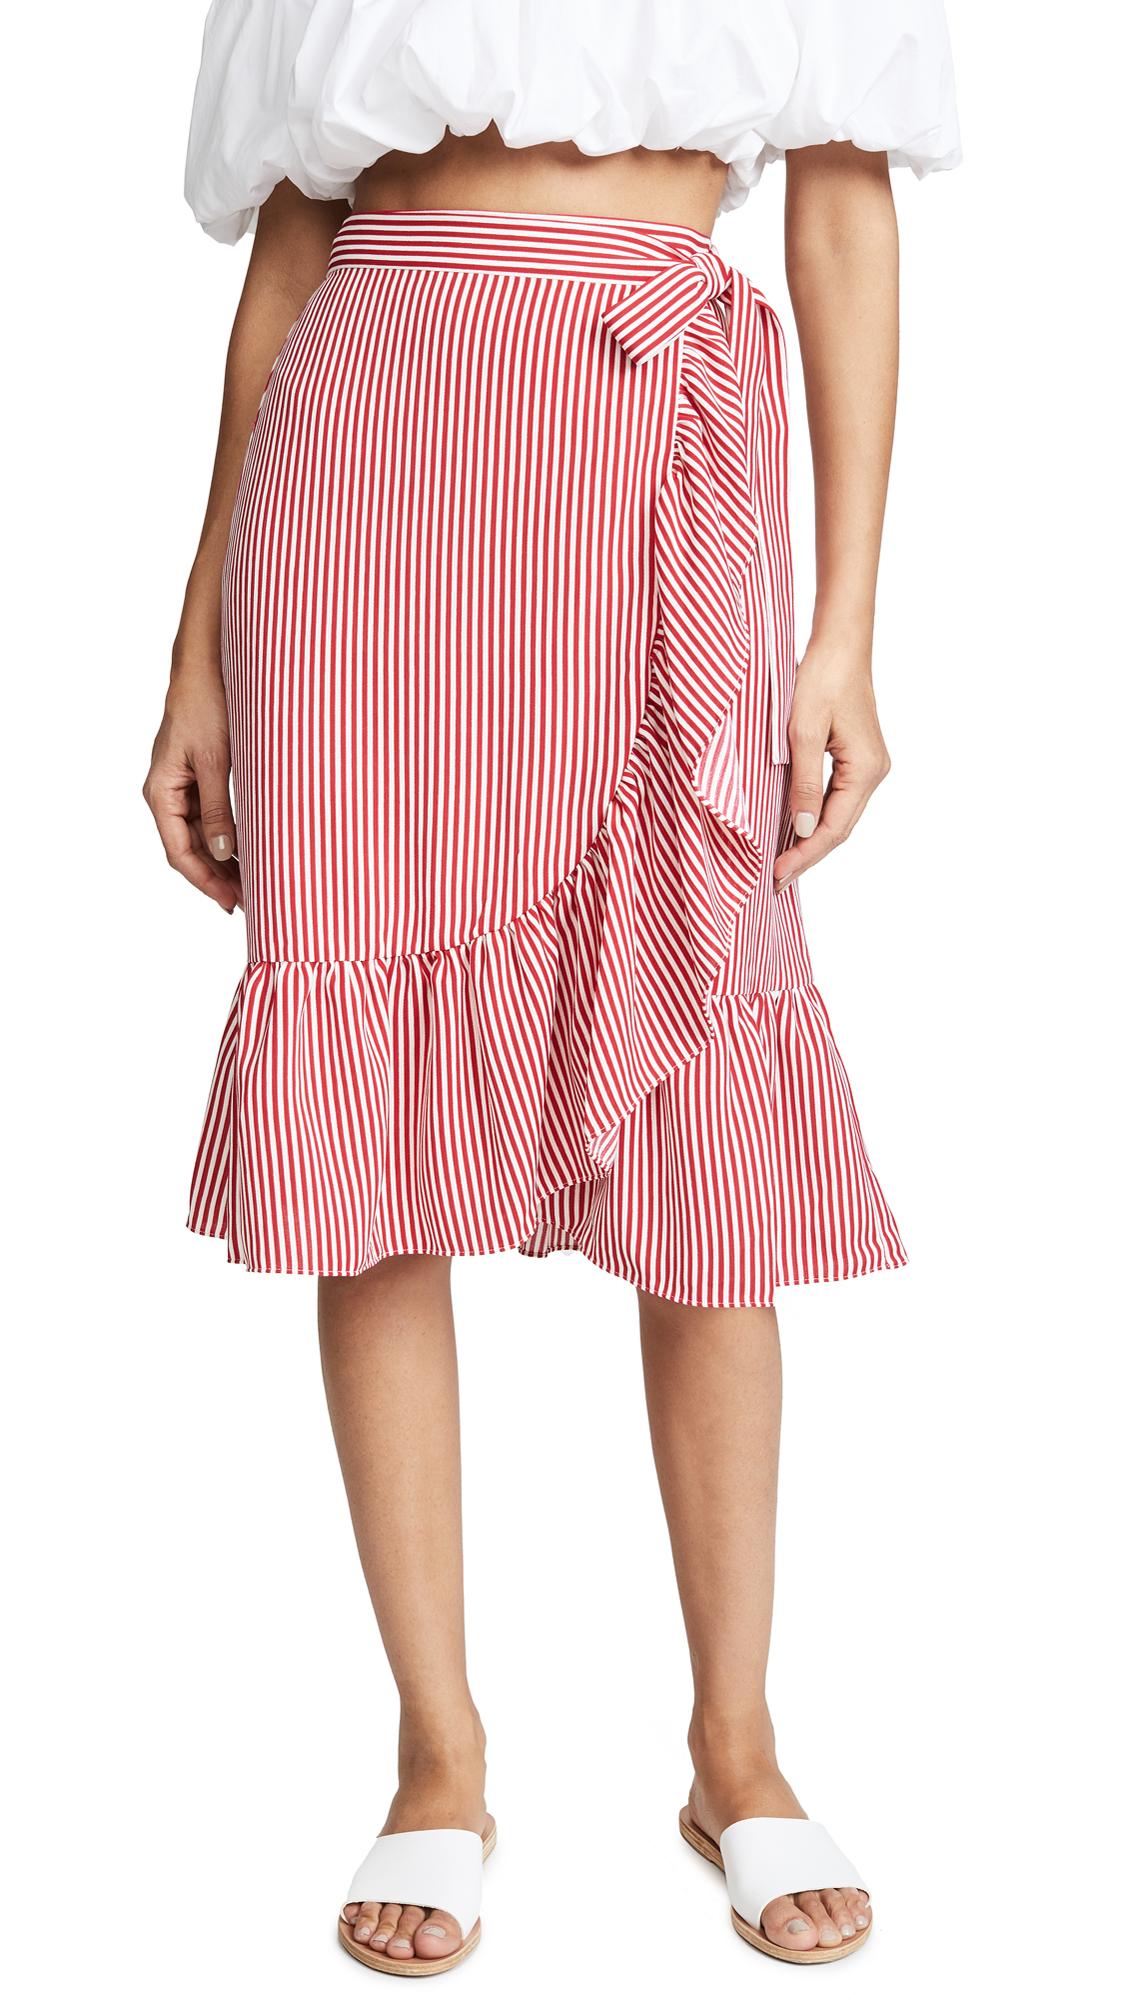 Club Monaco Tedon Skirt In Red/White